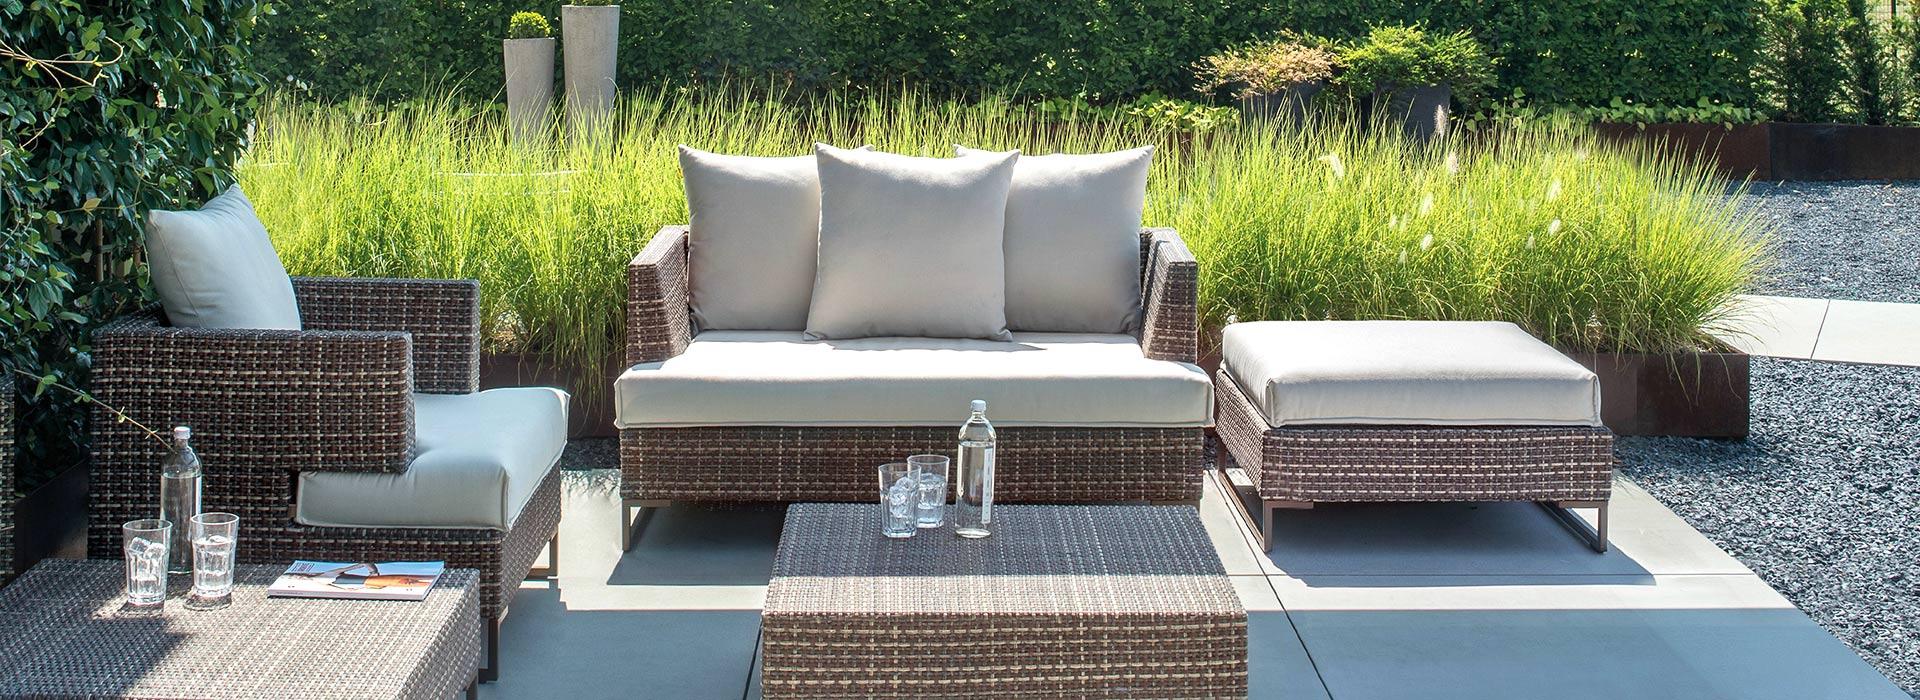 Emejing mobili da giardino on line gallery for Arredo giardino online shop